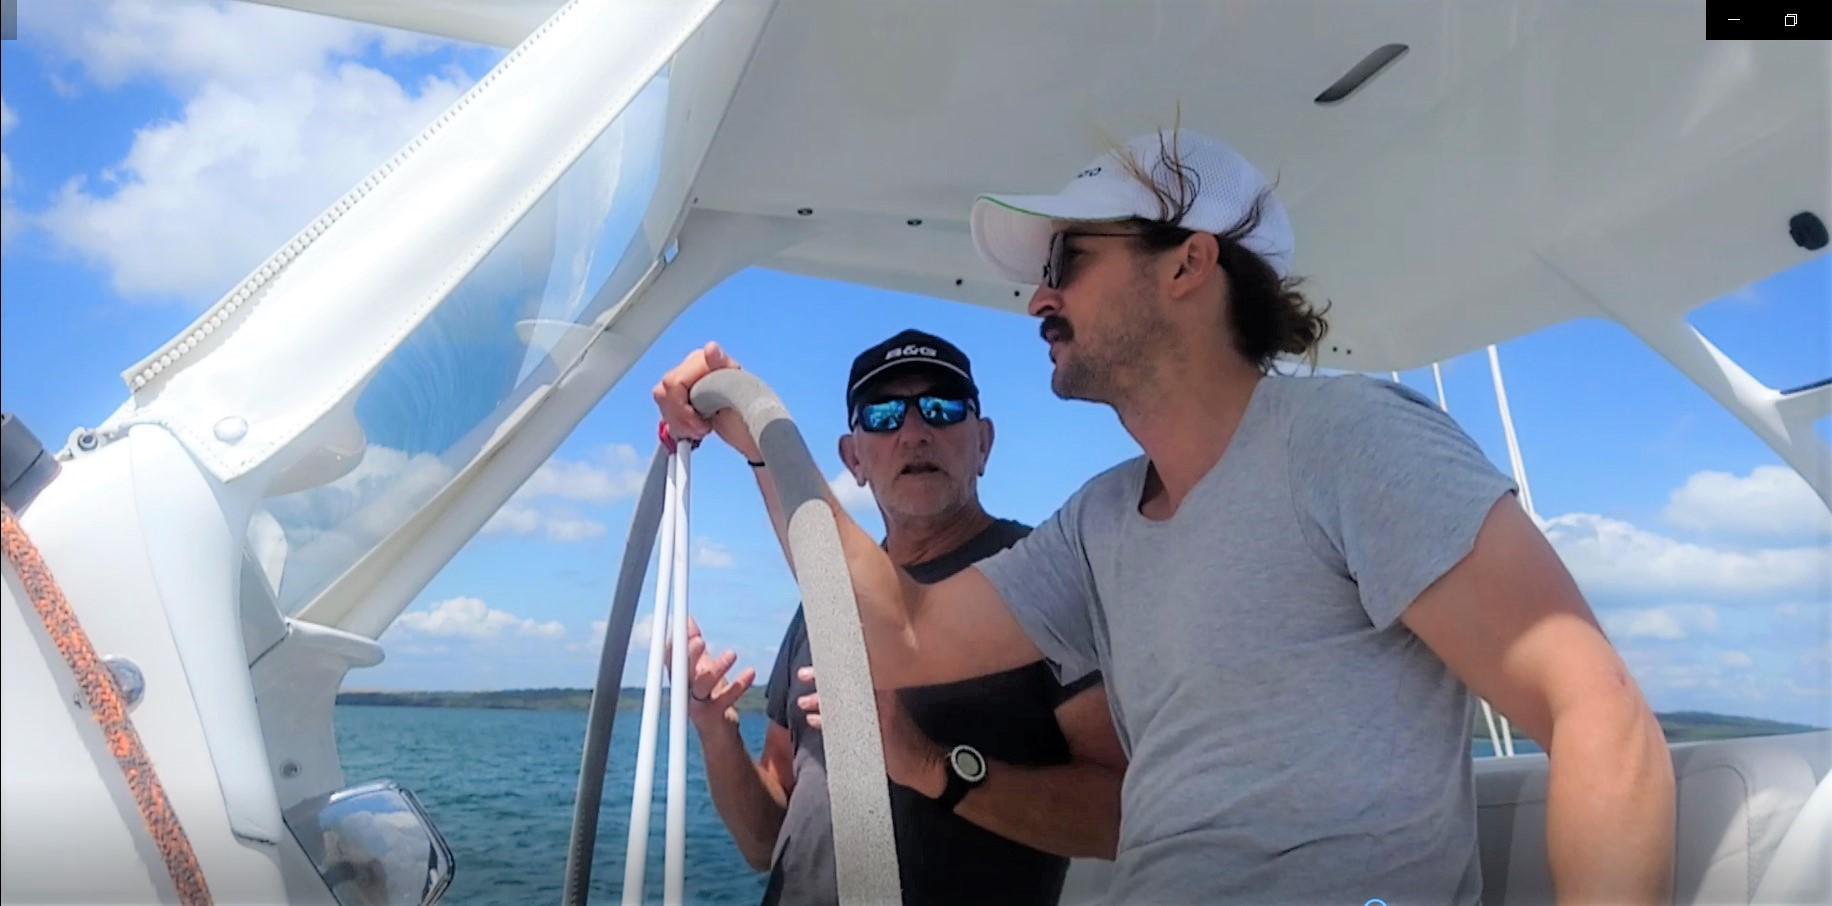 Sailing La Vagabonde choose Rapido 60 to sail world's oceans